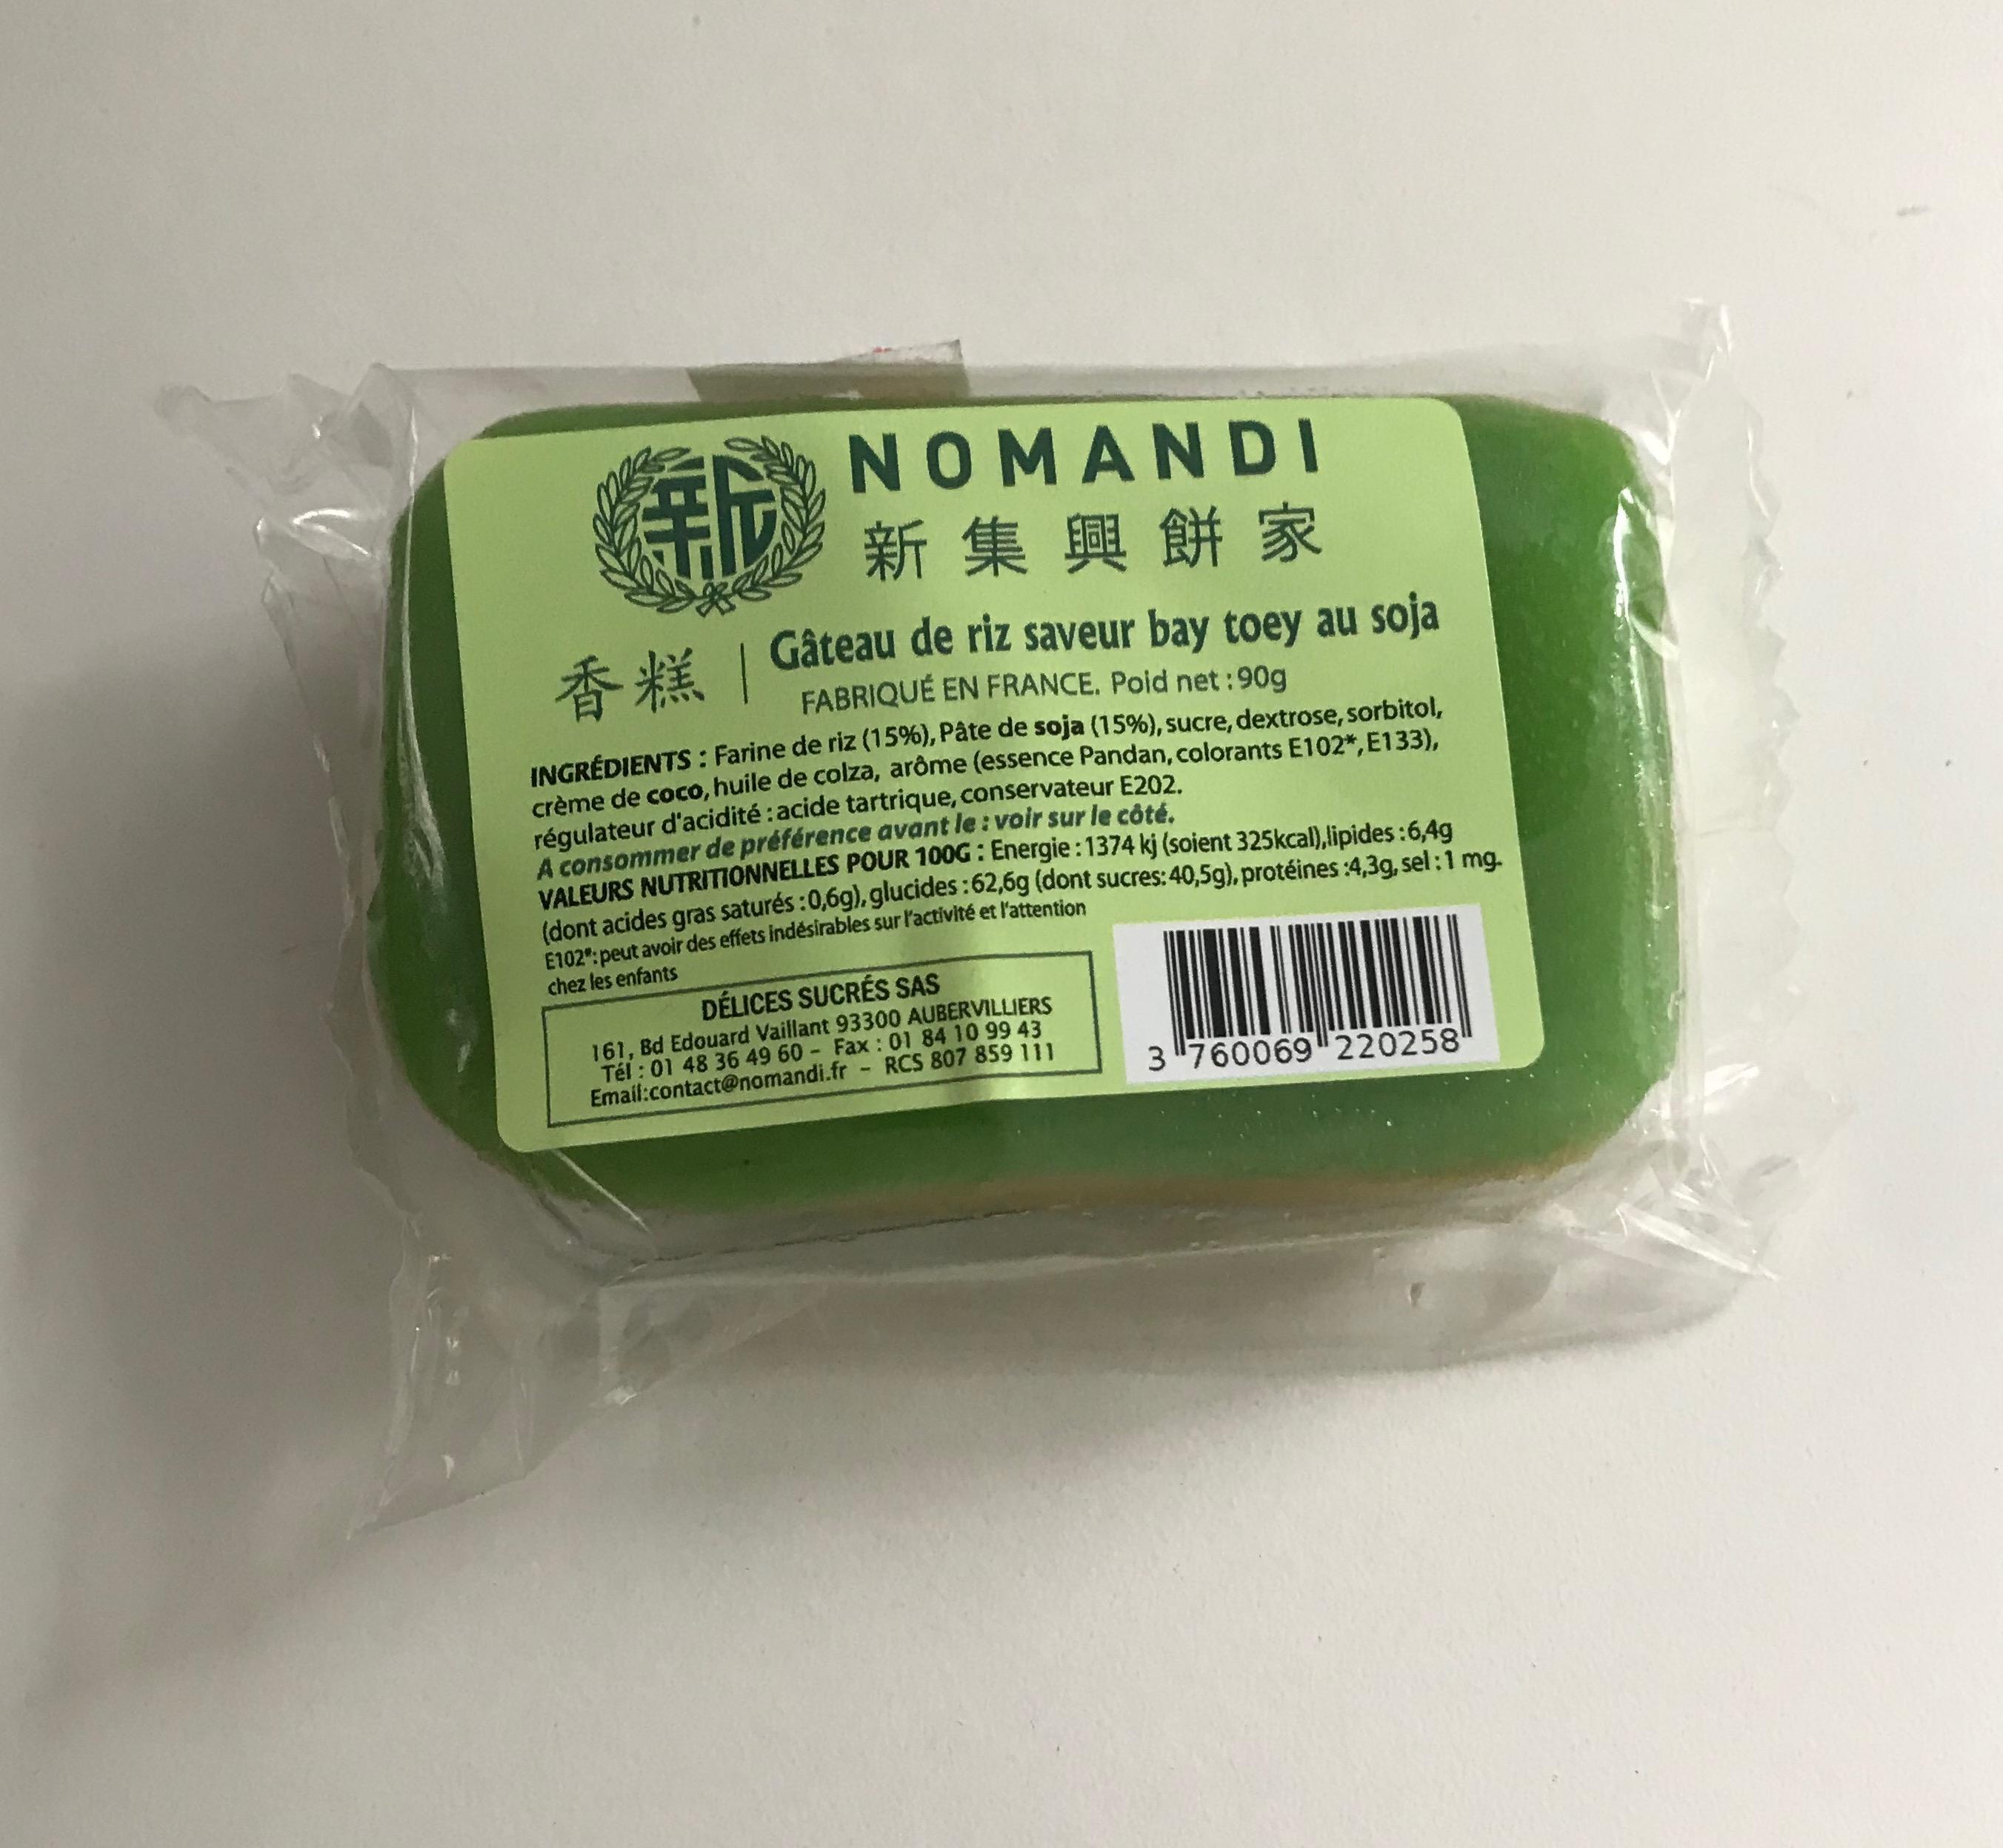 Gateau de riz saveur bay toey au soja, Nomandi (90 g)